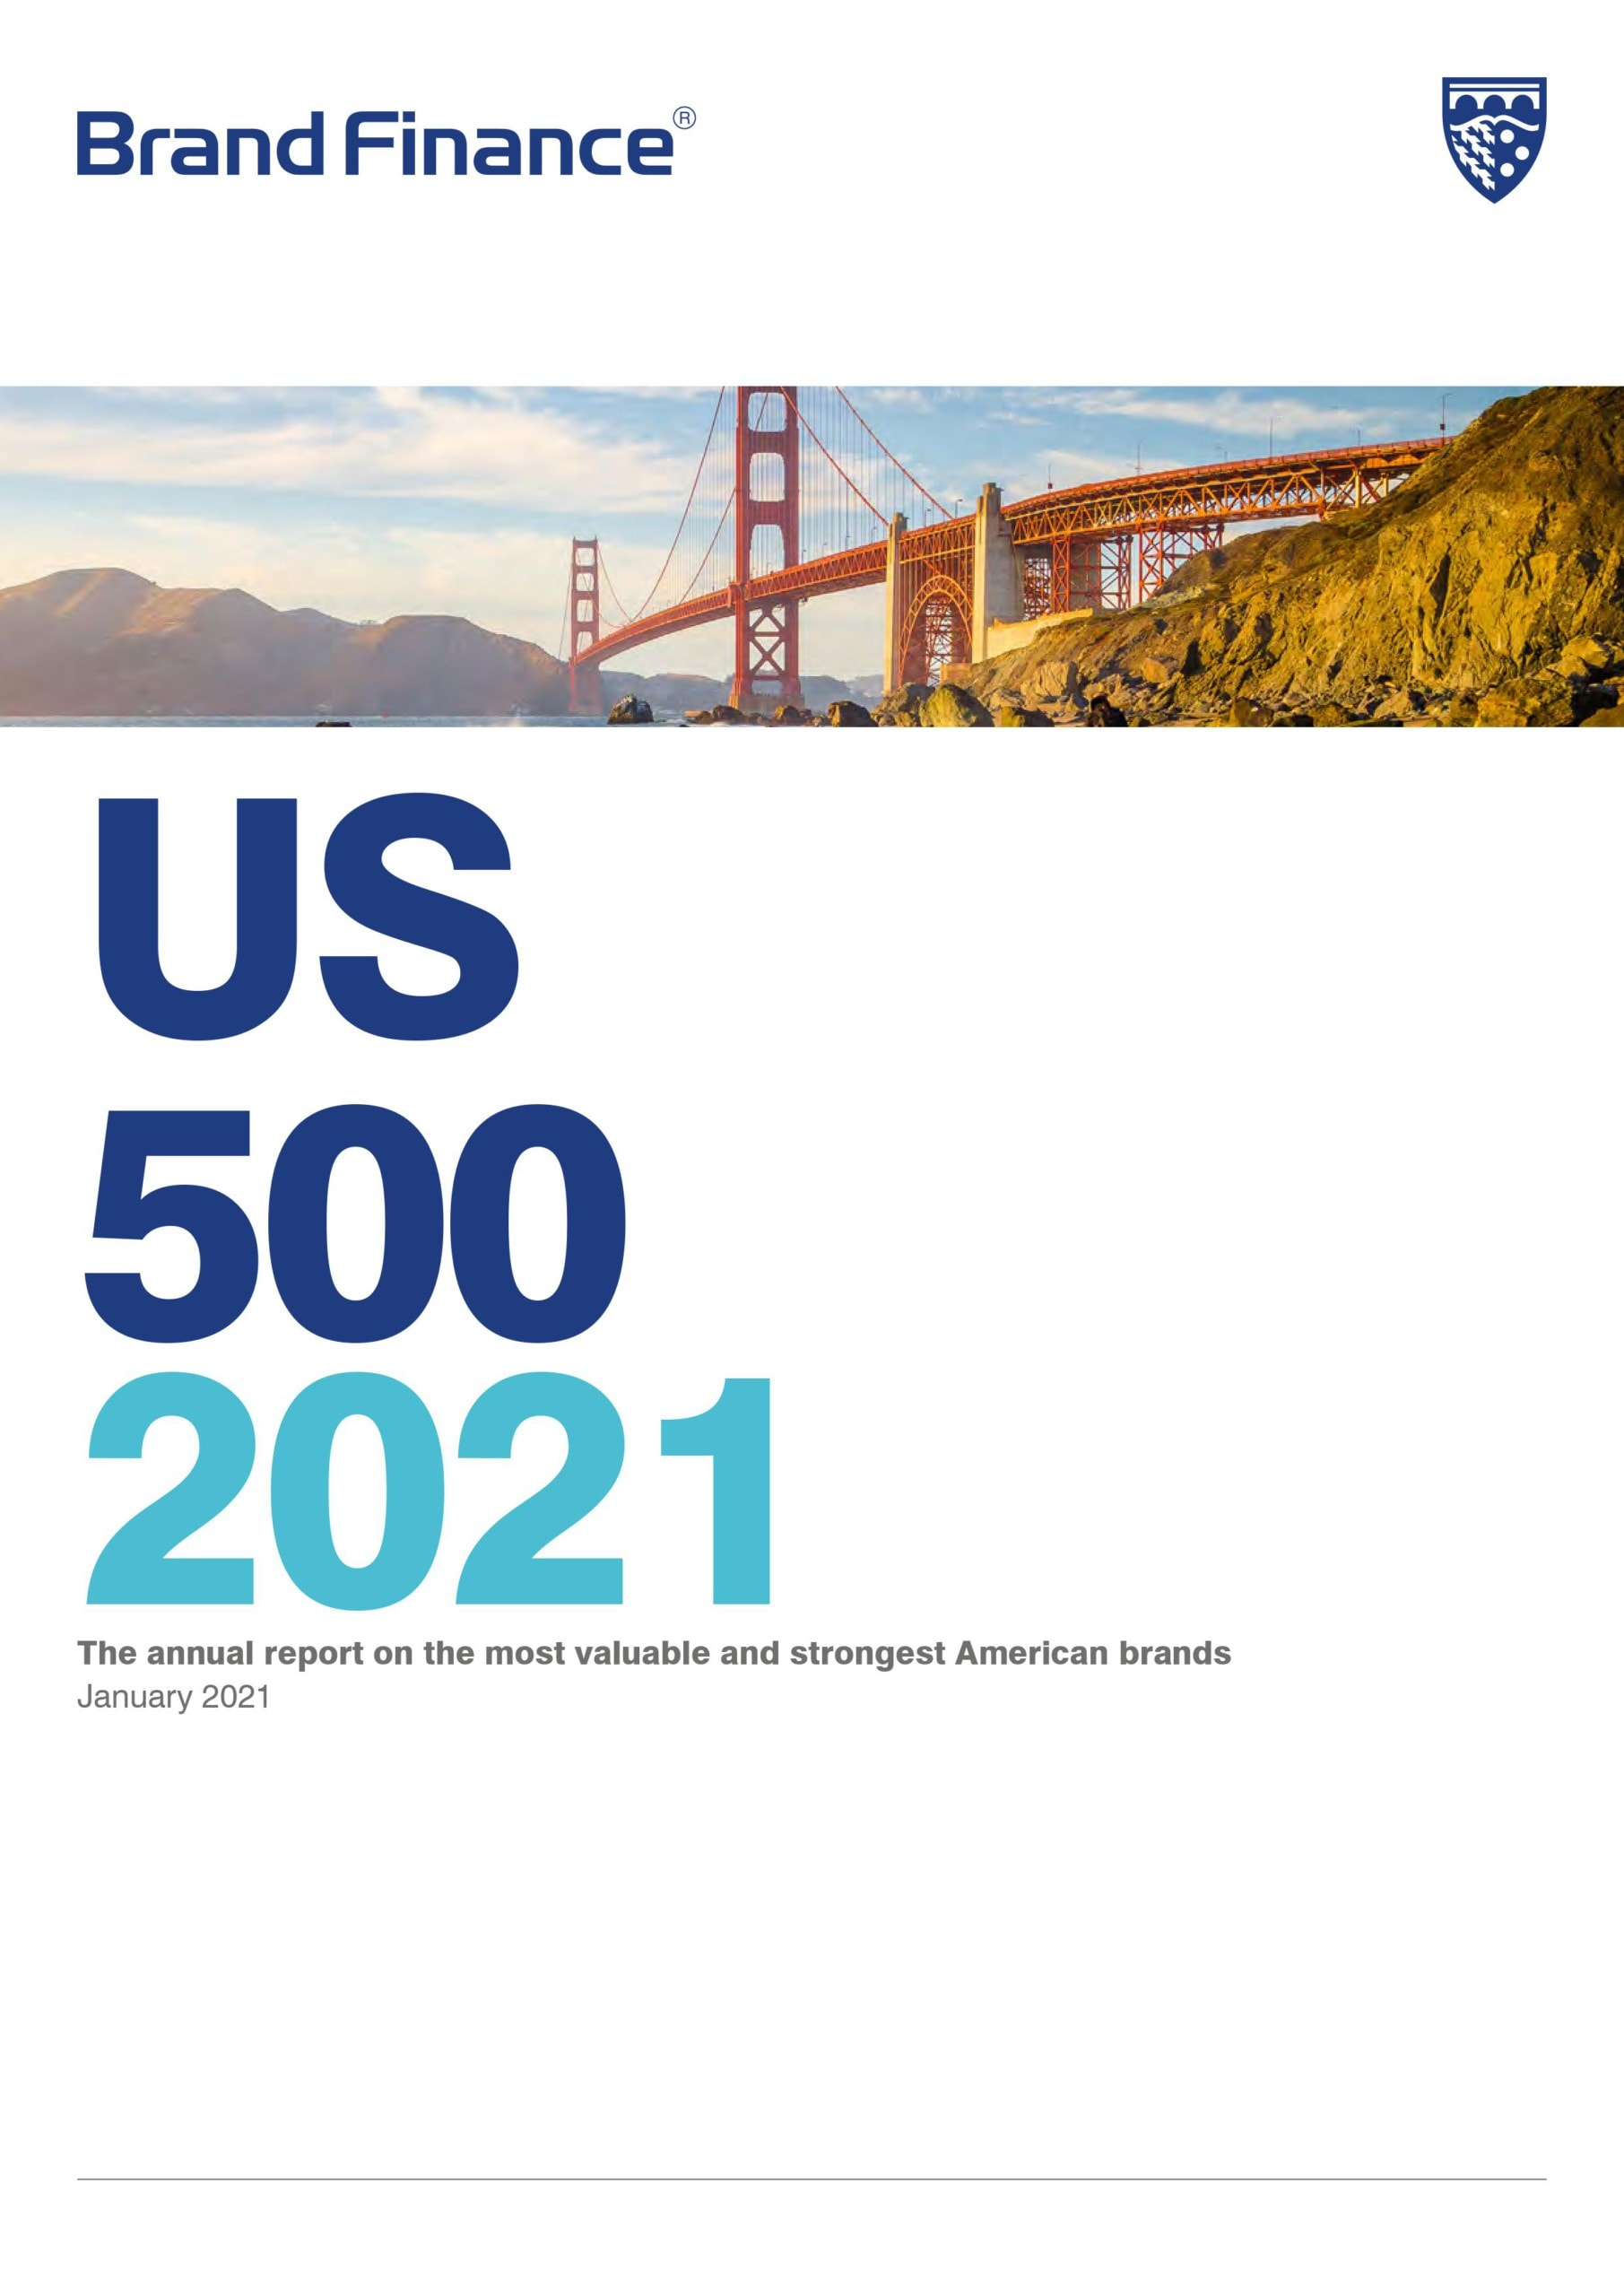 Brand Finance US 500 2021